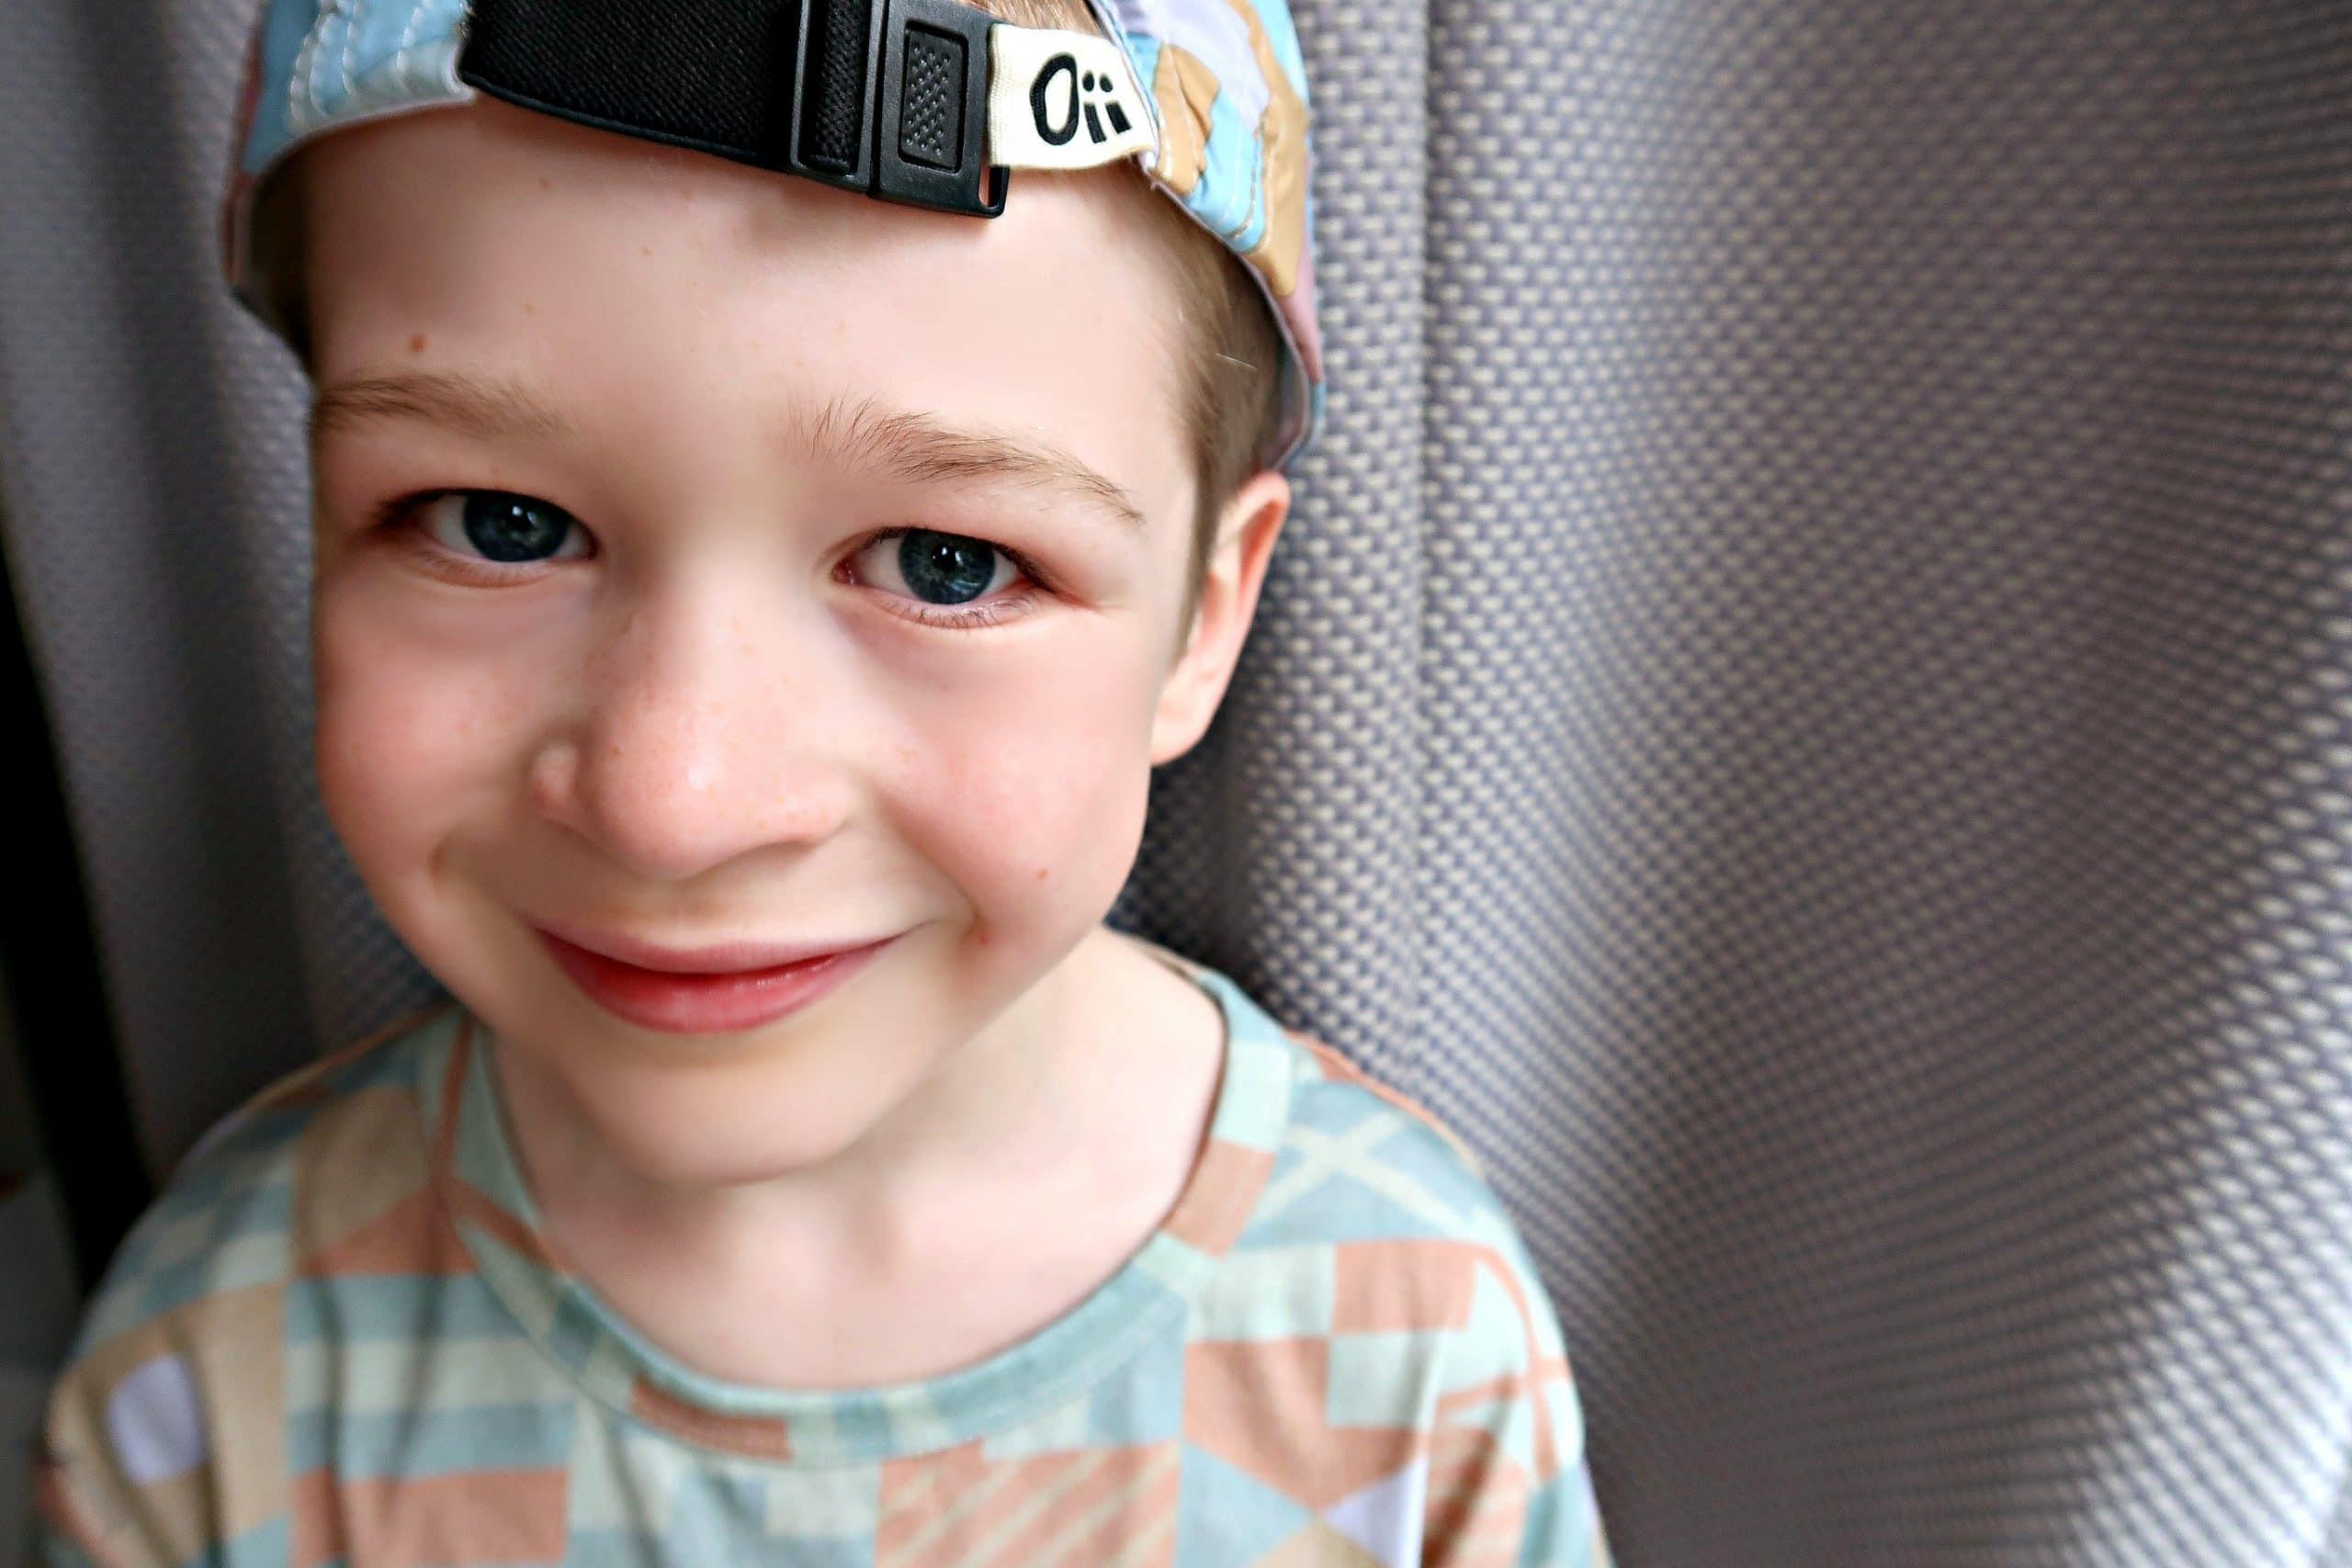 Boy wearing Oii cap backwards.